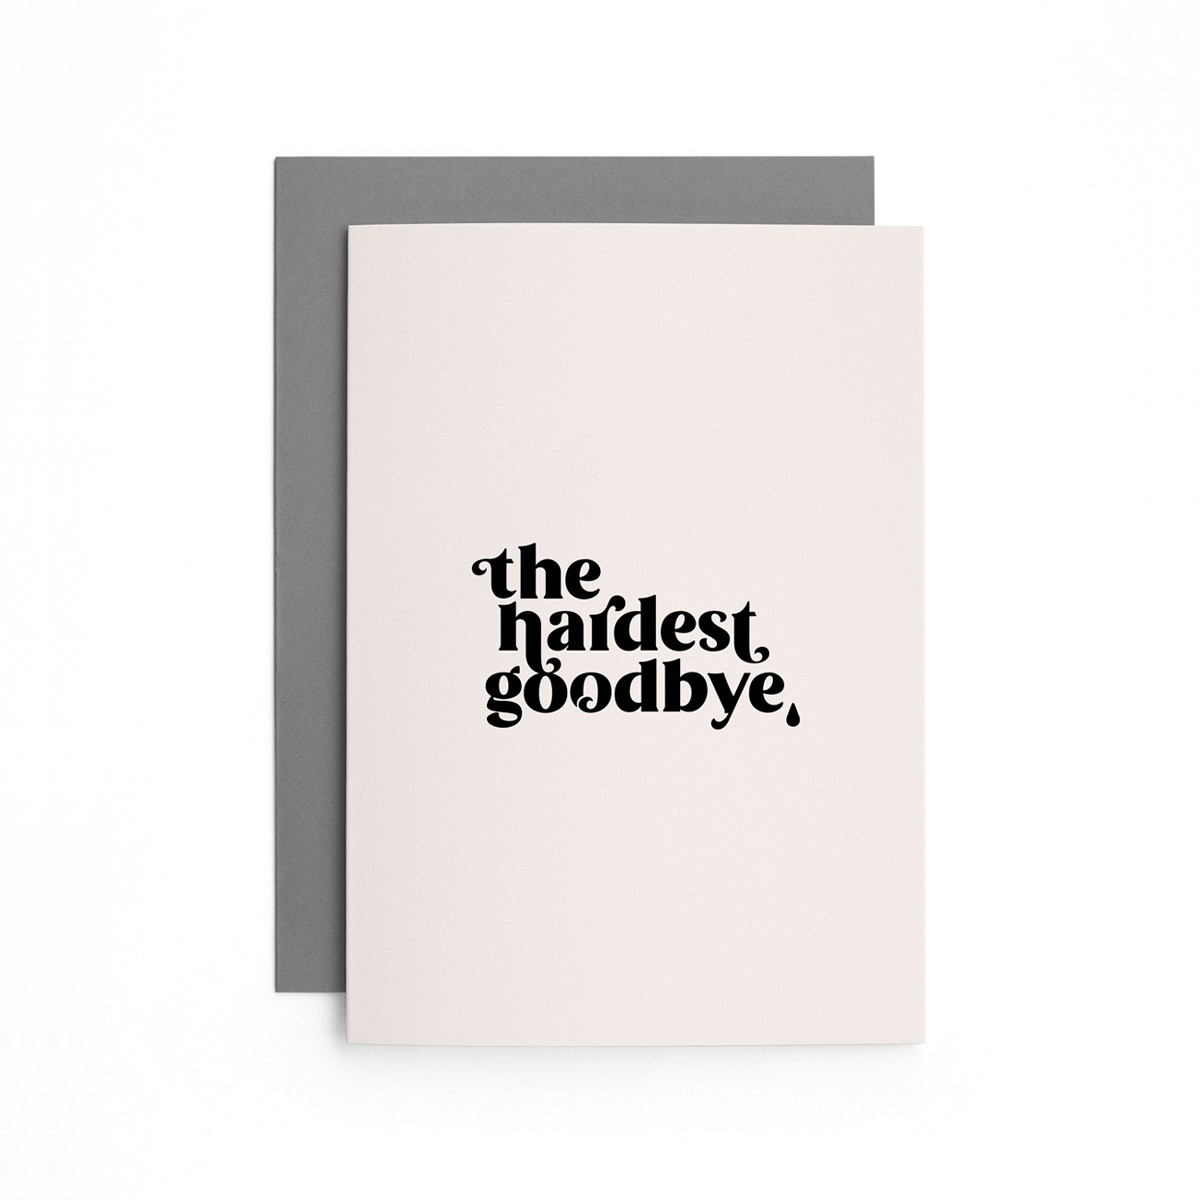 Set Abschied Von Herzen | 4er Set Klappkarten inkl. Umschlag | heartfelt paper & co